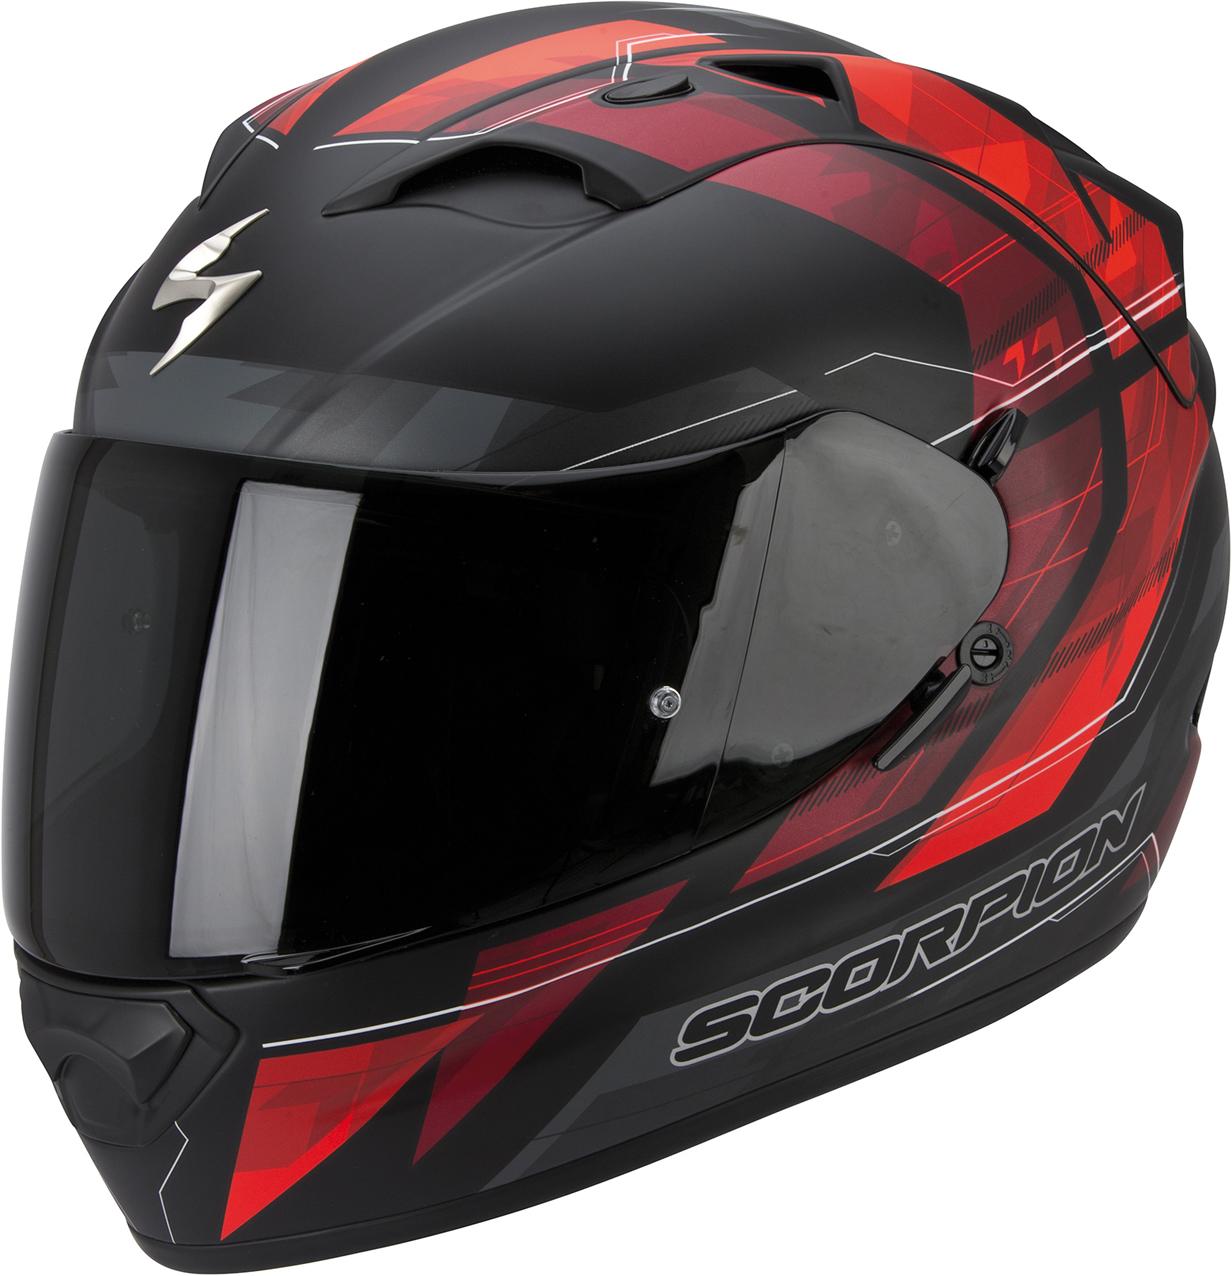 scorpion exo 1200 air hornet mitico bikes vienna. Black Bedroom Furniture Sets. Home Design Ideas